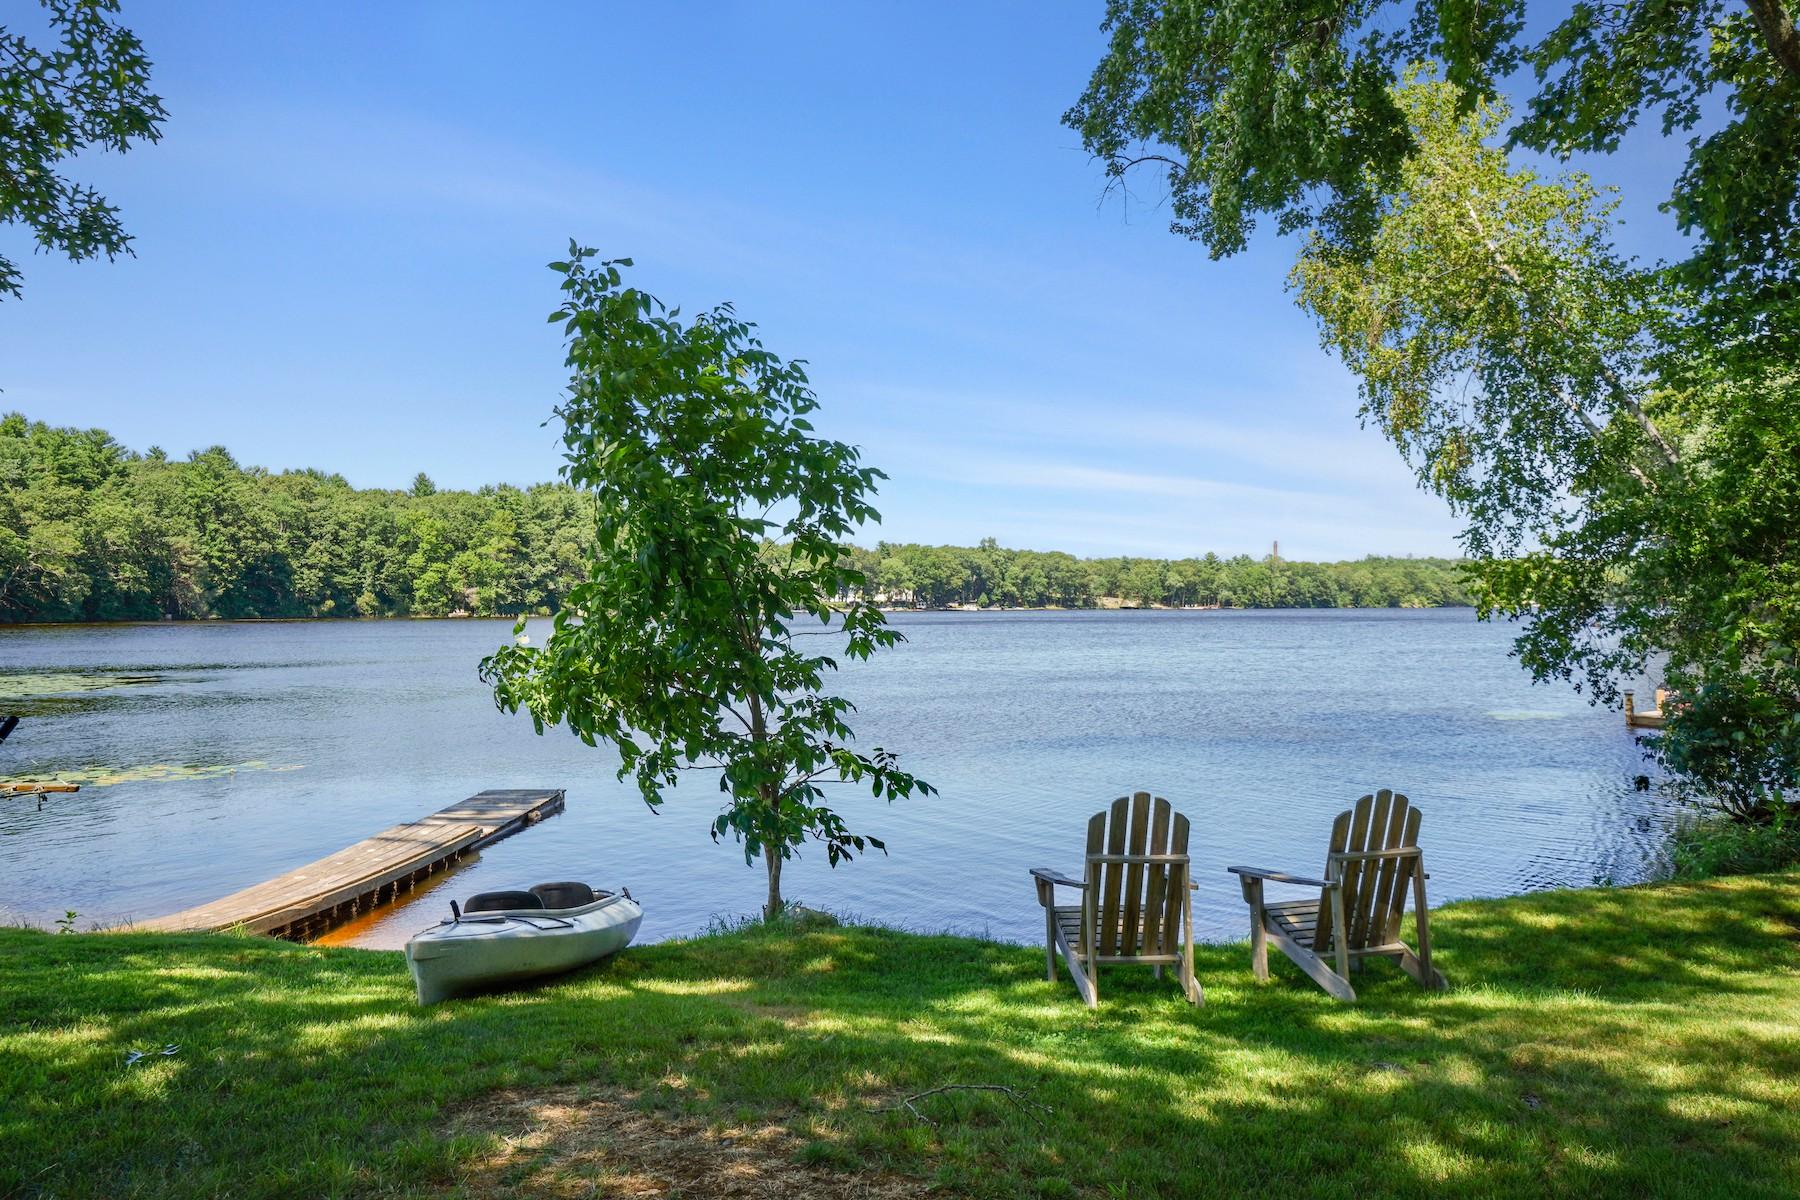 Trek chairs overlooking pond